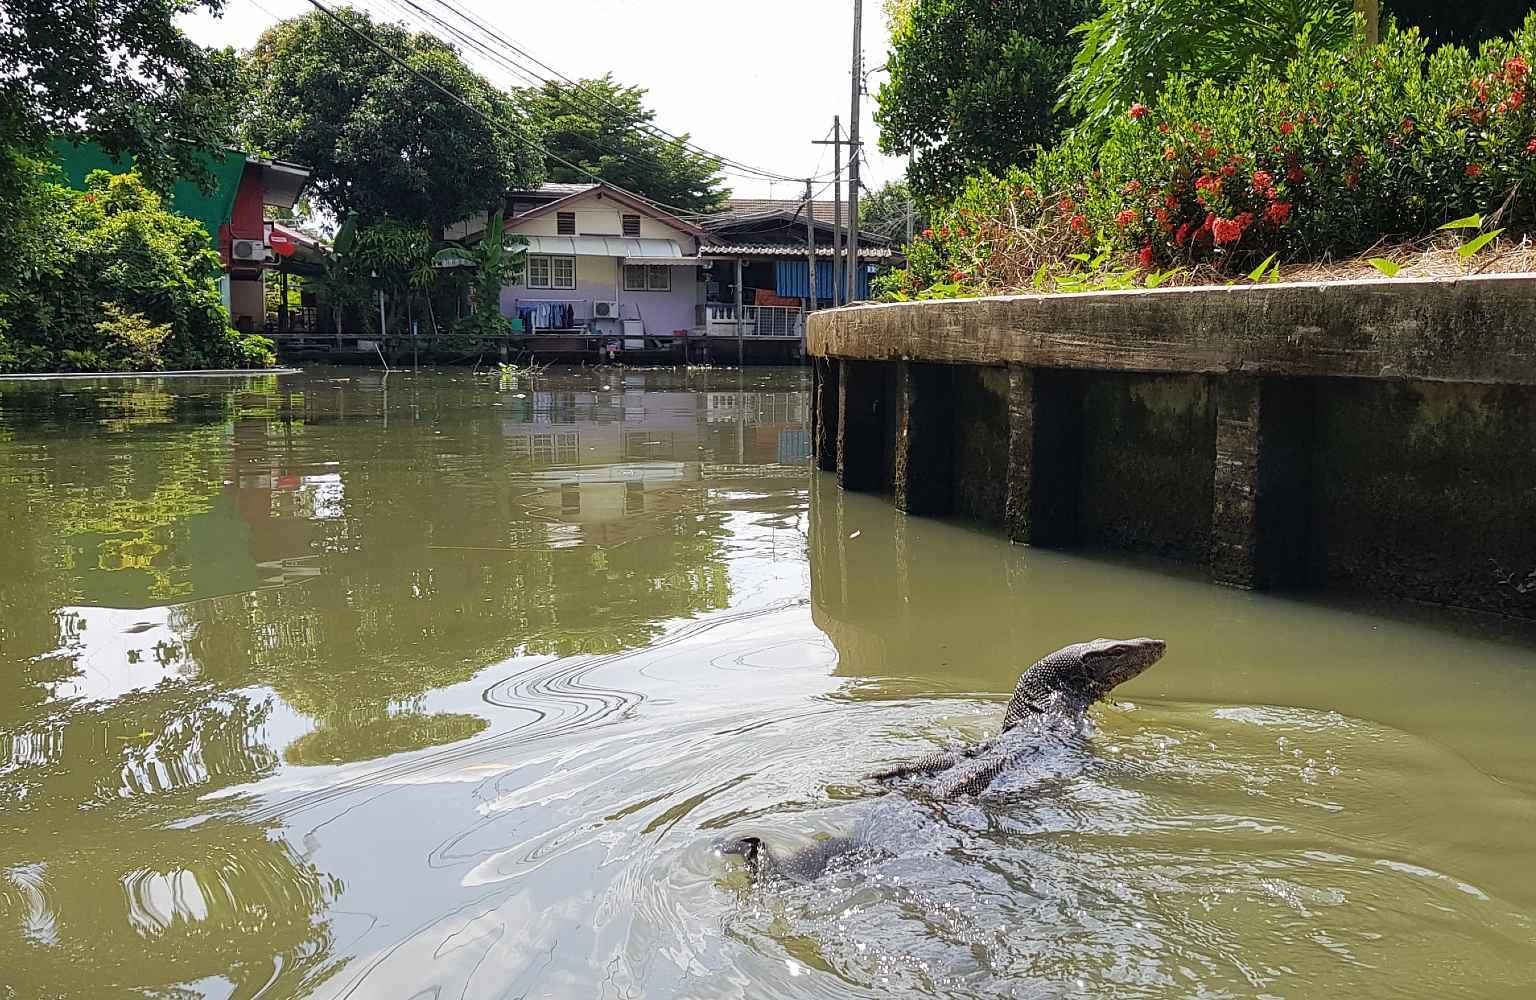 Grote varaan in een kanaal van Bangkok